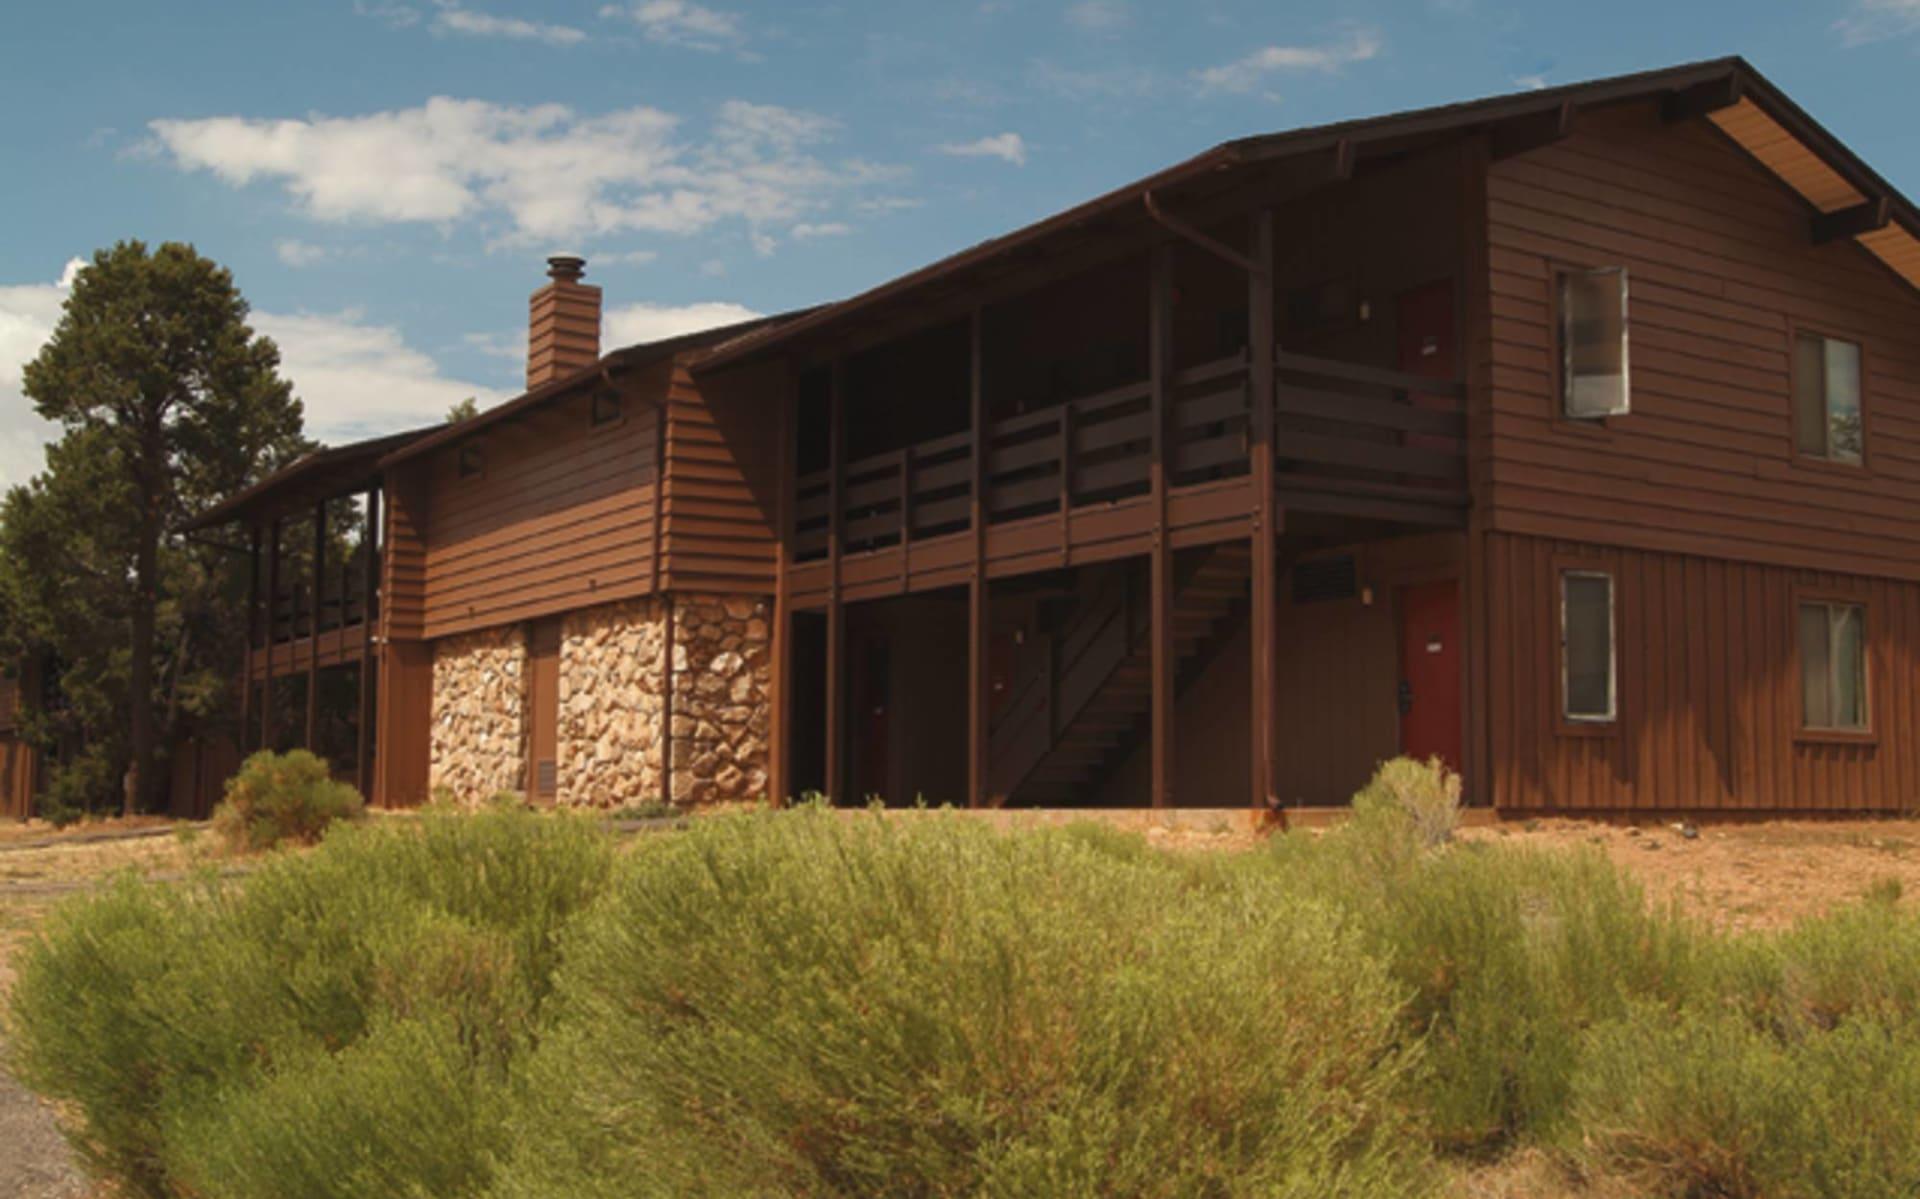 Maswik Lodge North in Grand Canyon Nationalpark: exterior maswik lodge north und south holzhütte